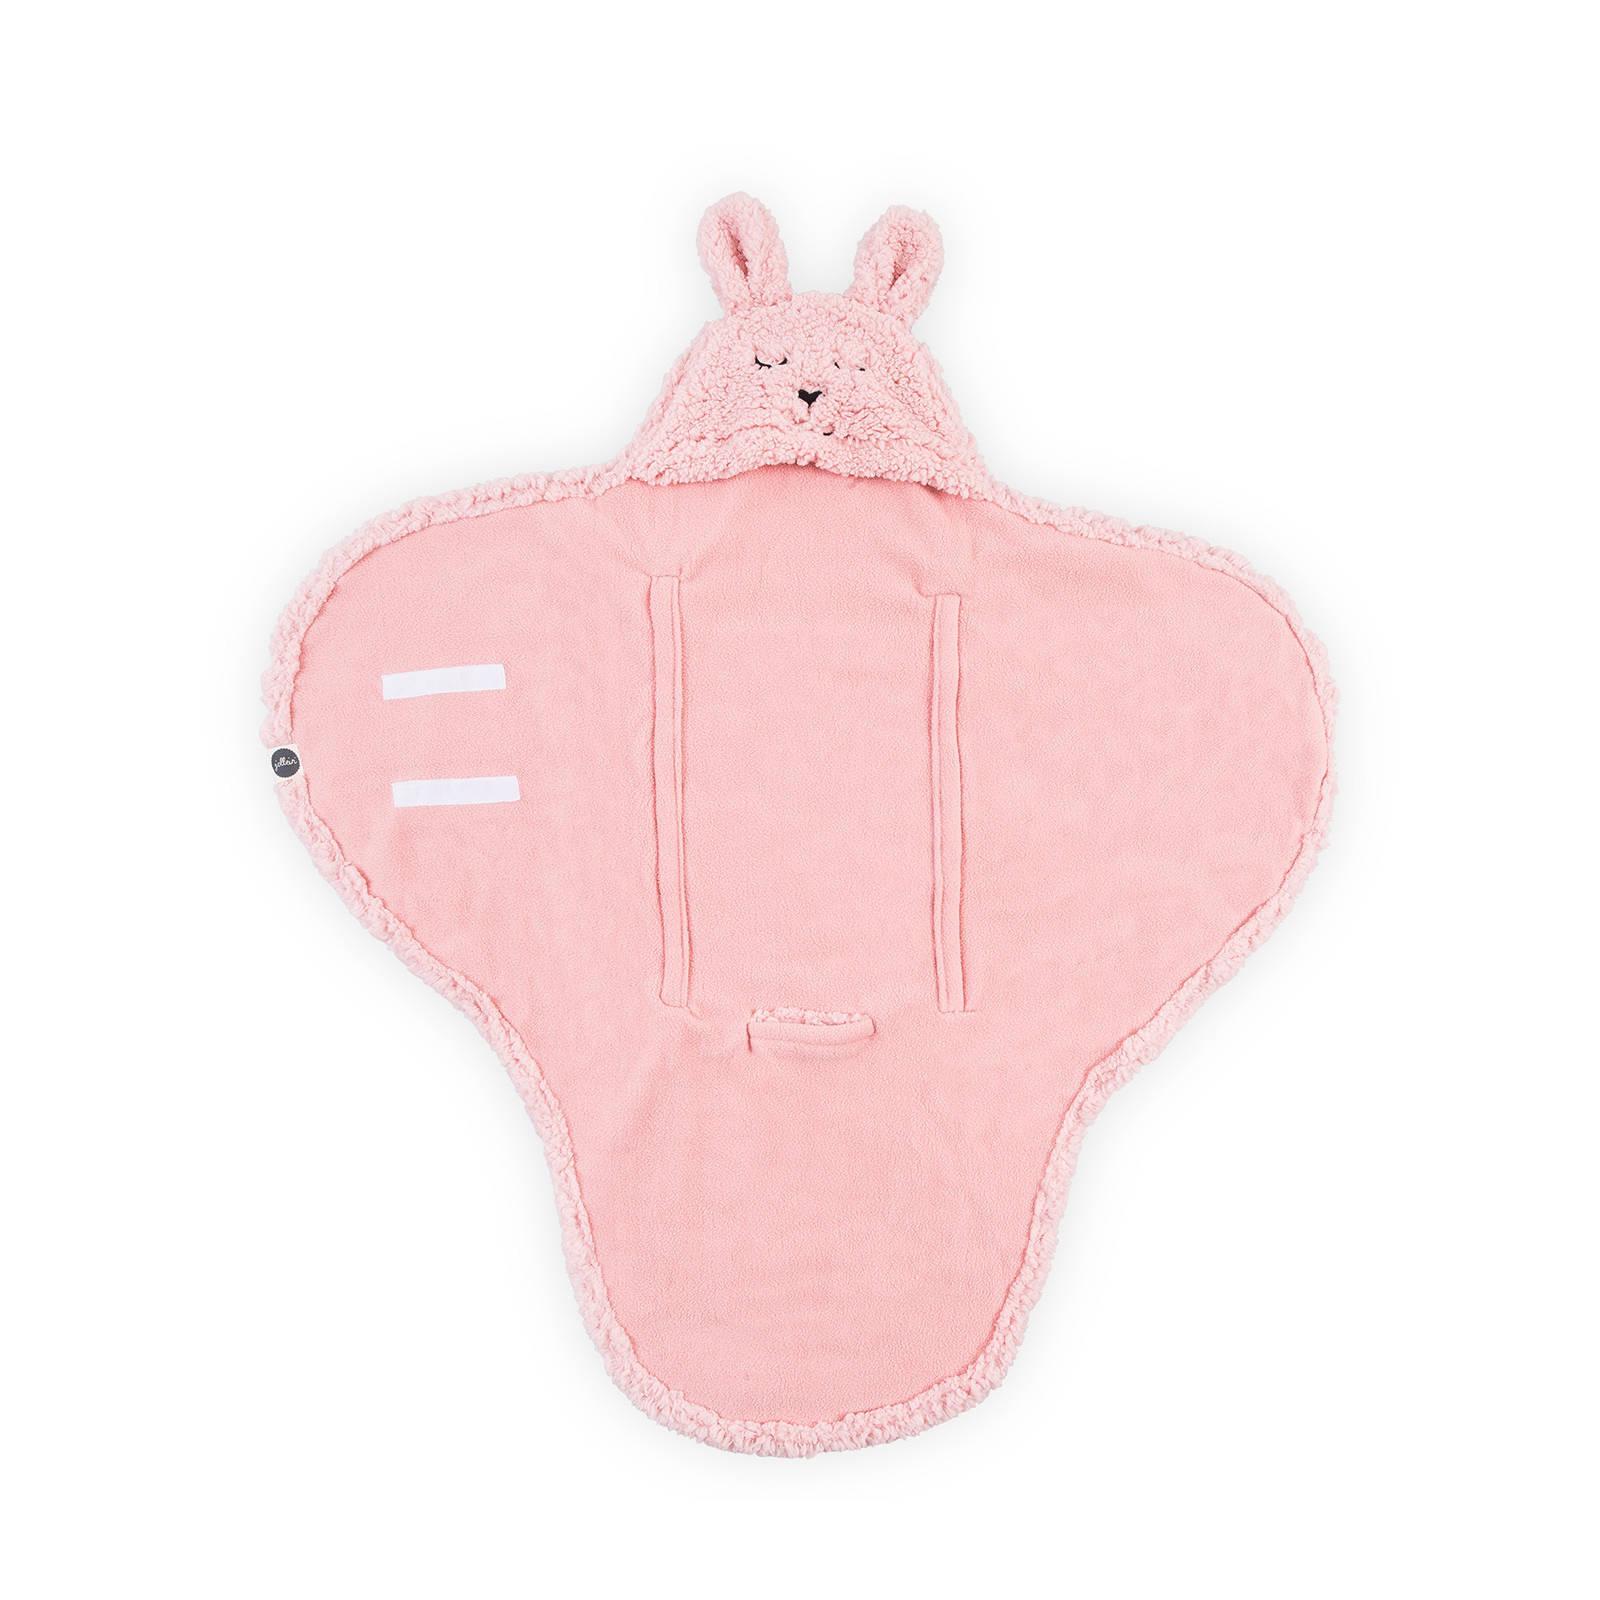 a3cf09c9399 Jollein Bunny wikkeldeken roze | wehkamp